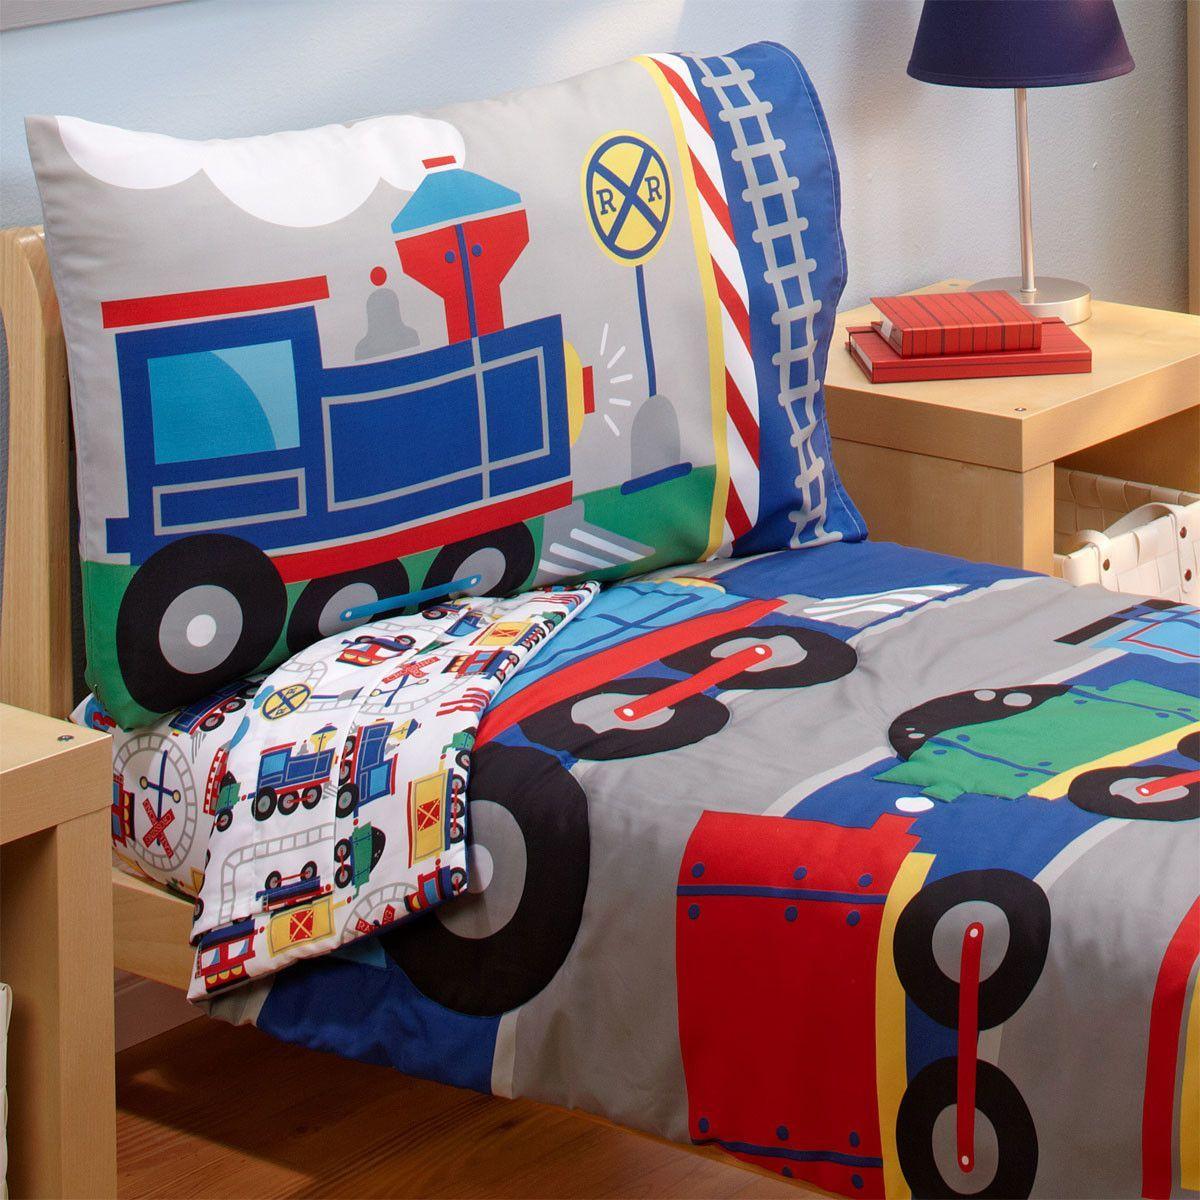 Choo Choo Trains Bed Ensemble 4 Piece Toddler Bedding Set